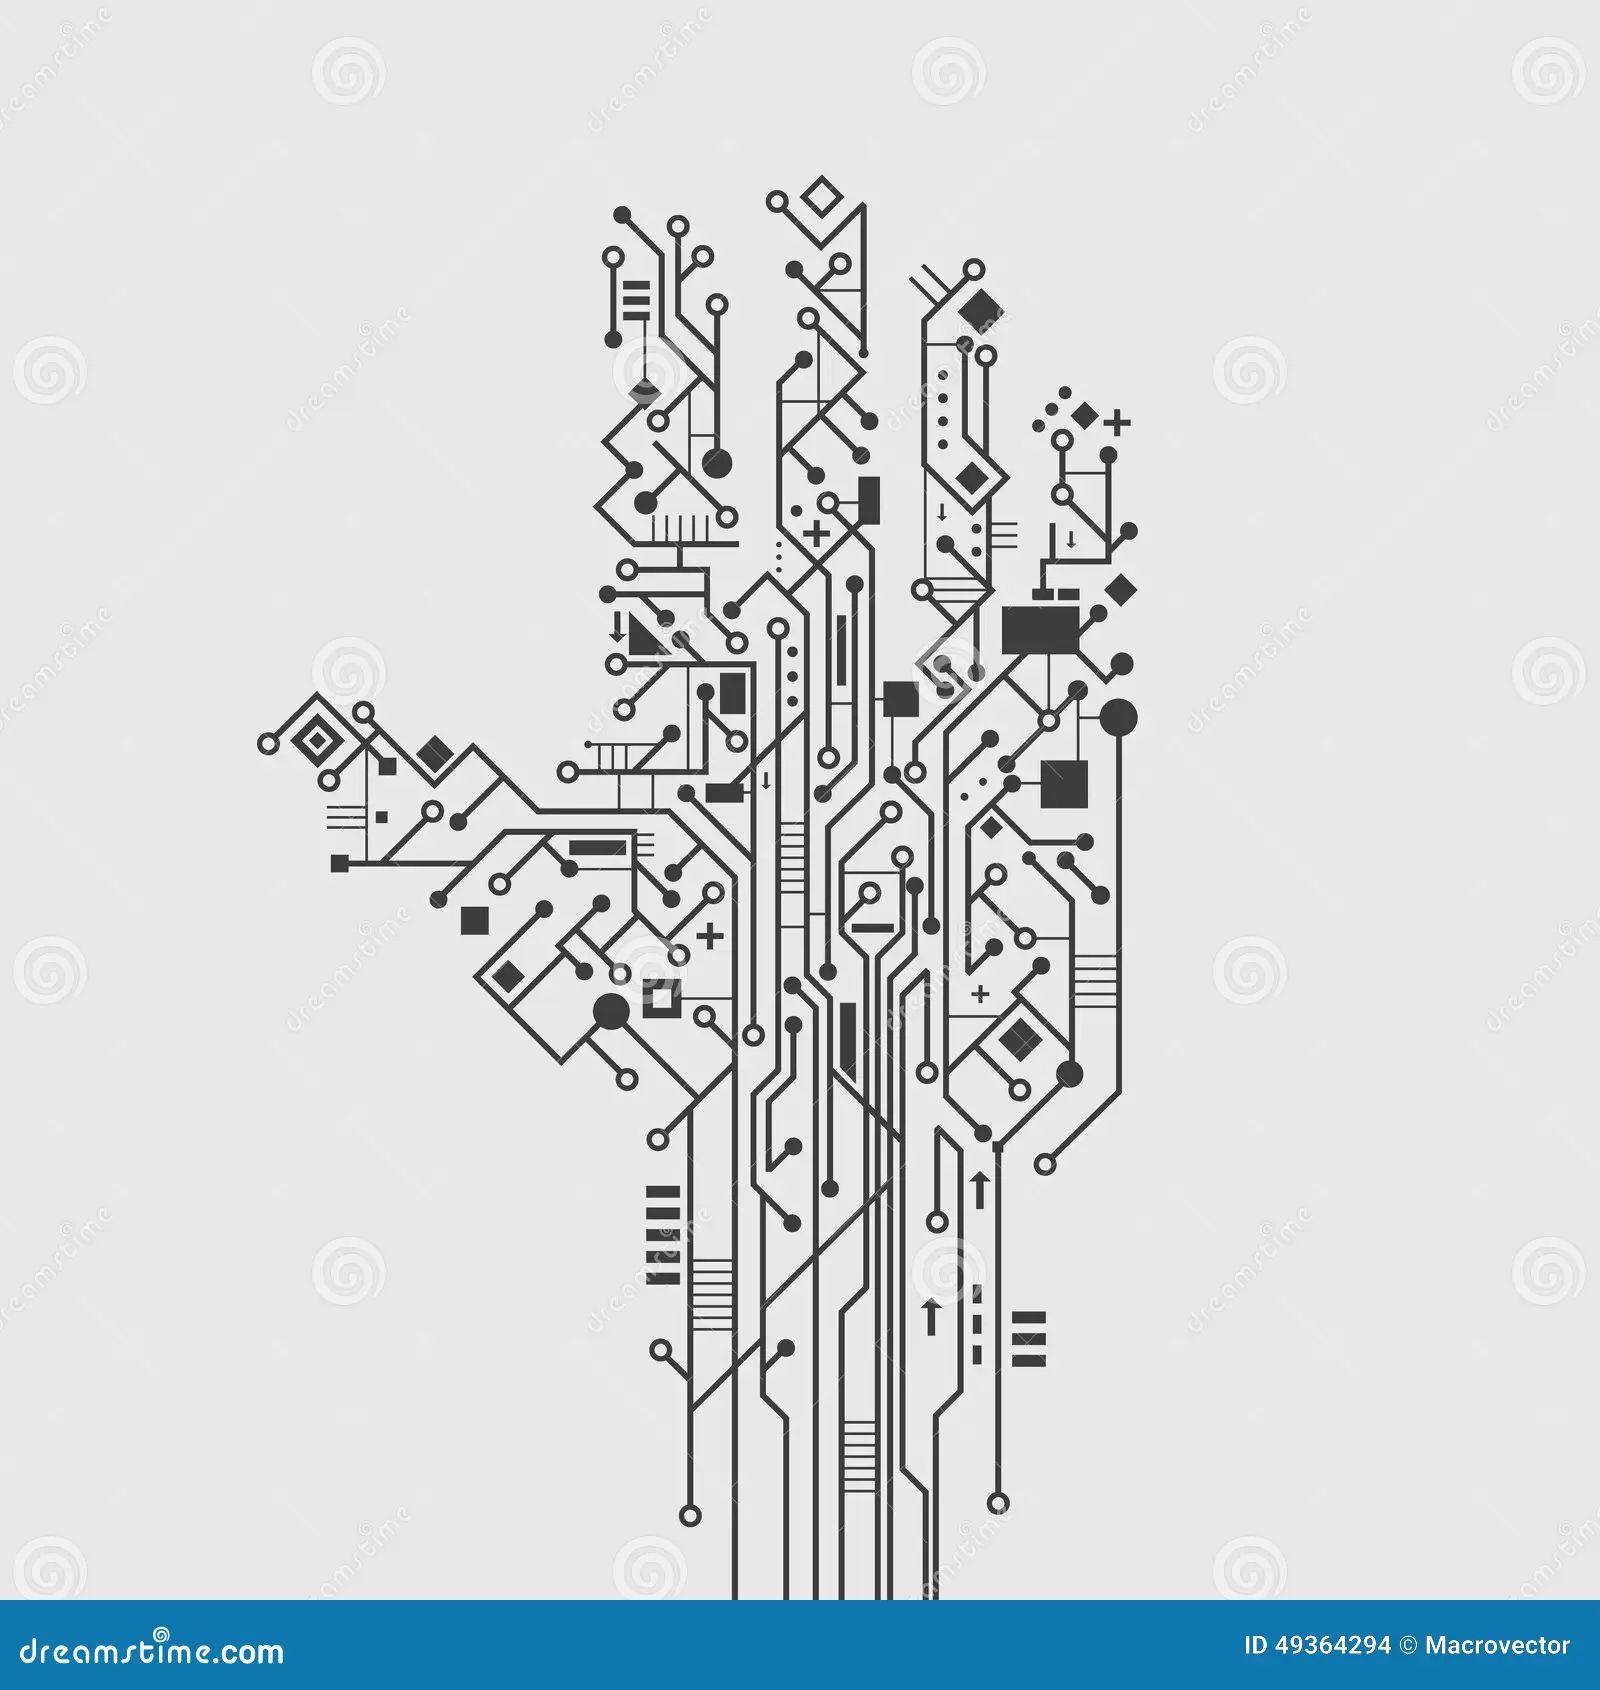 circuit board for kids